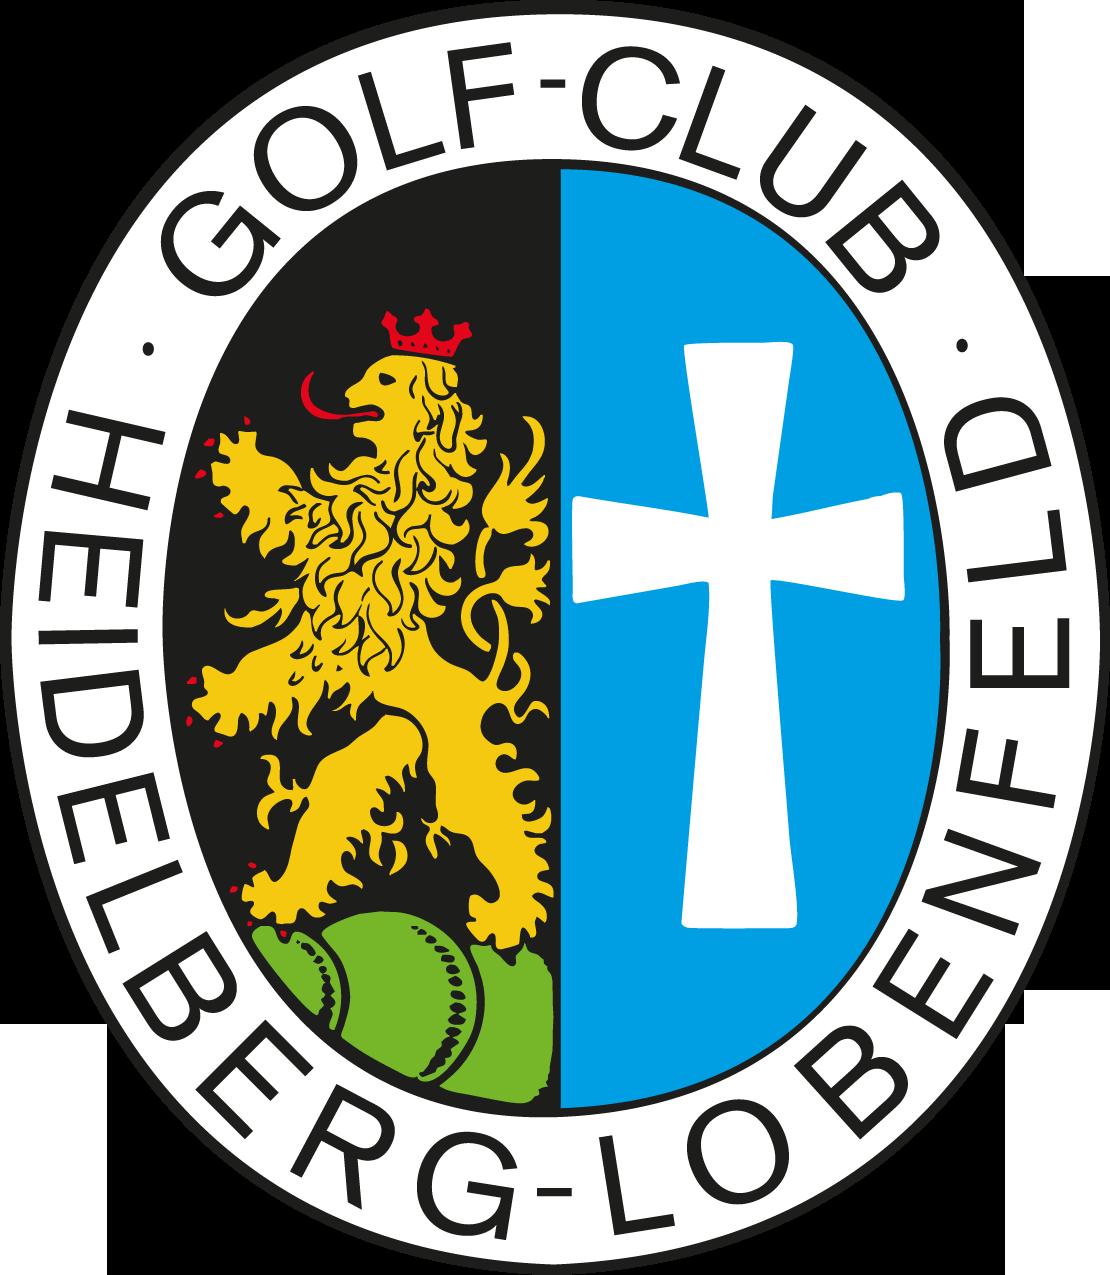 Golfclub Heidelberg-Lobenfeld